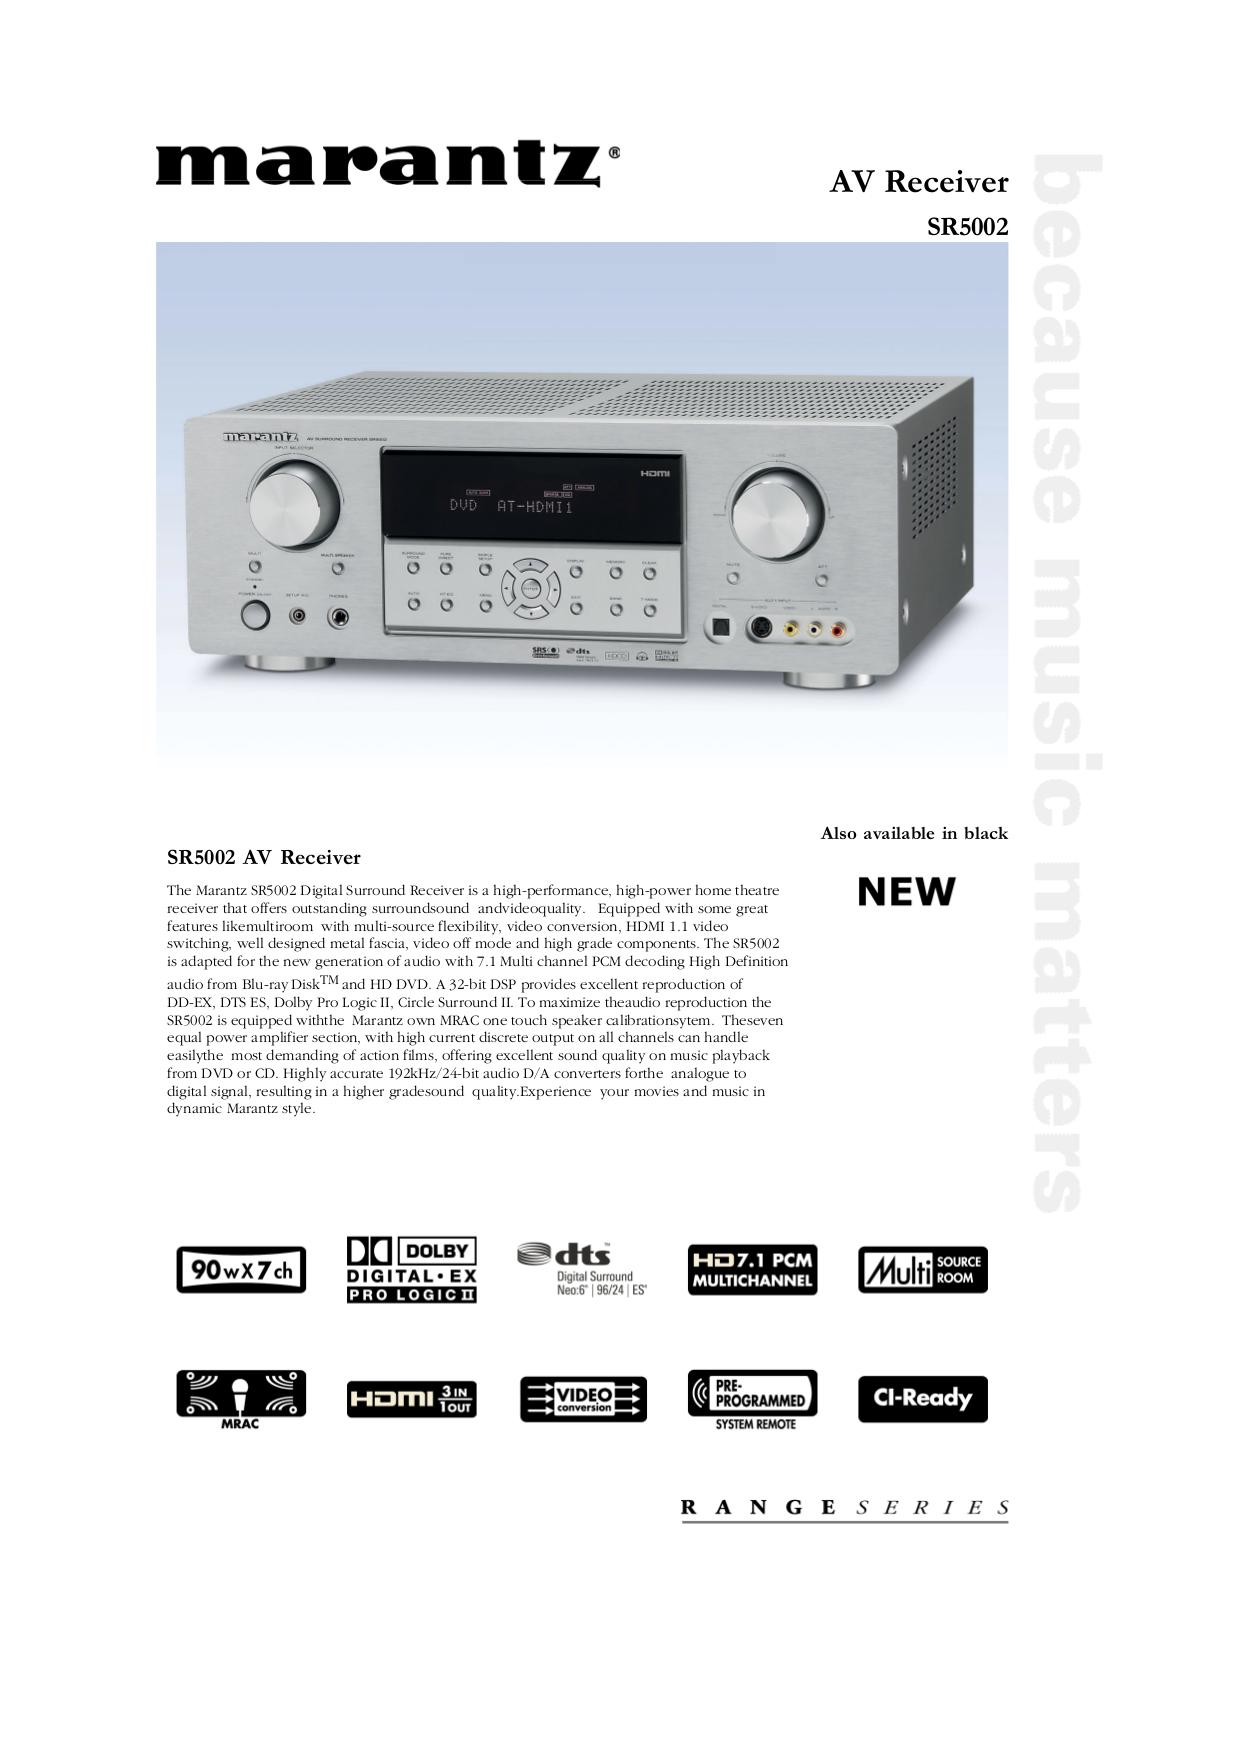 download free pdf for marantz sr5002 receiver manual rh umlib com Marantz SR5002 Receiver Marantz Receivers